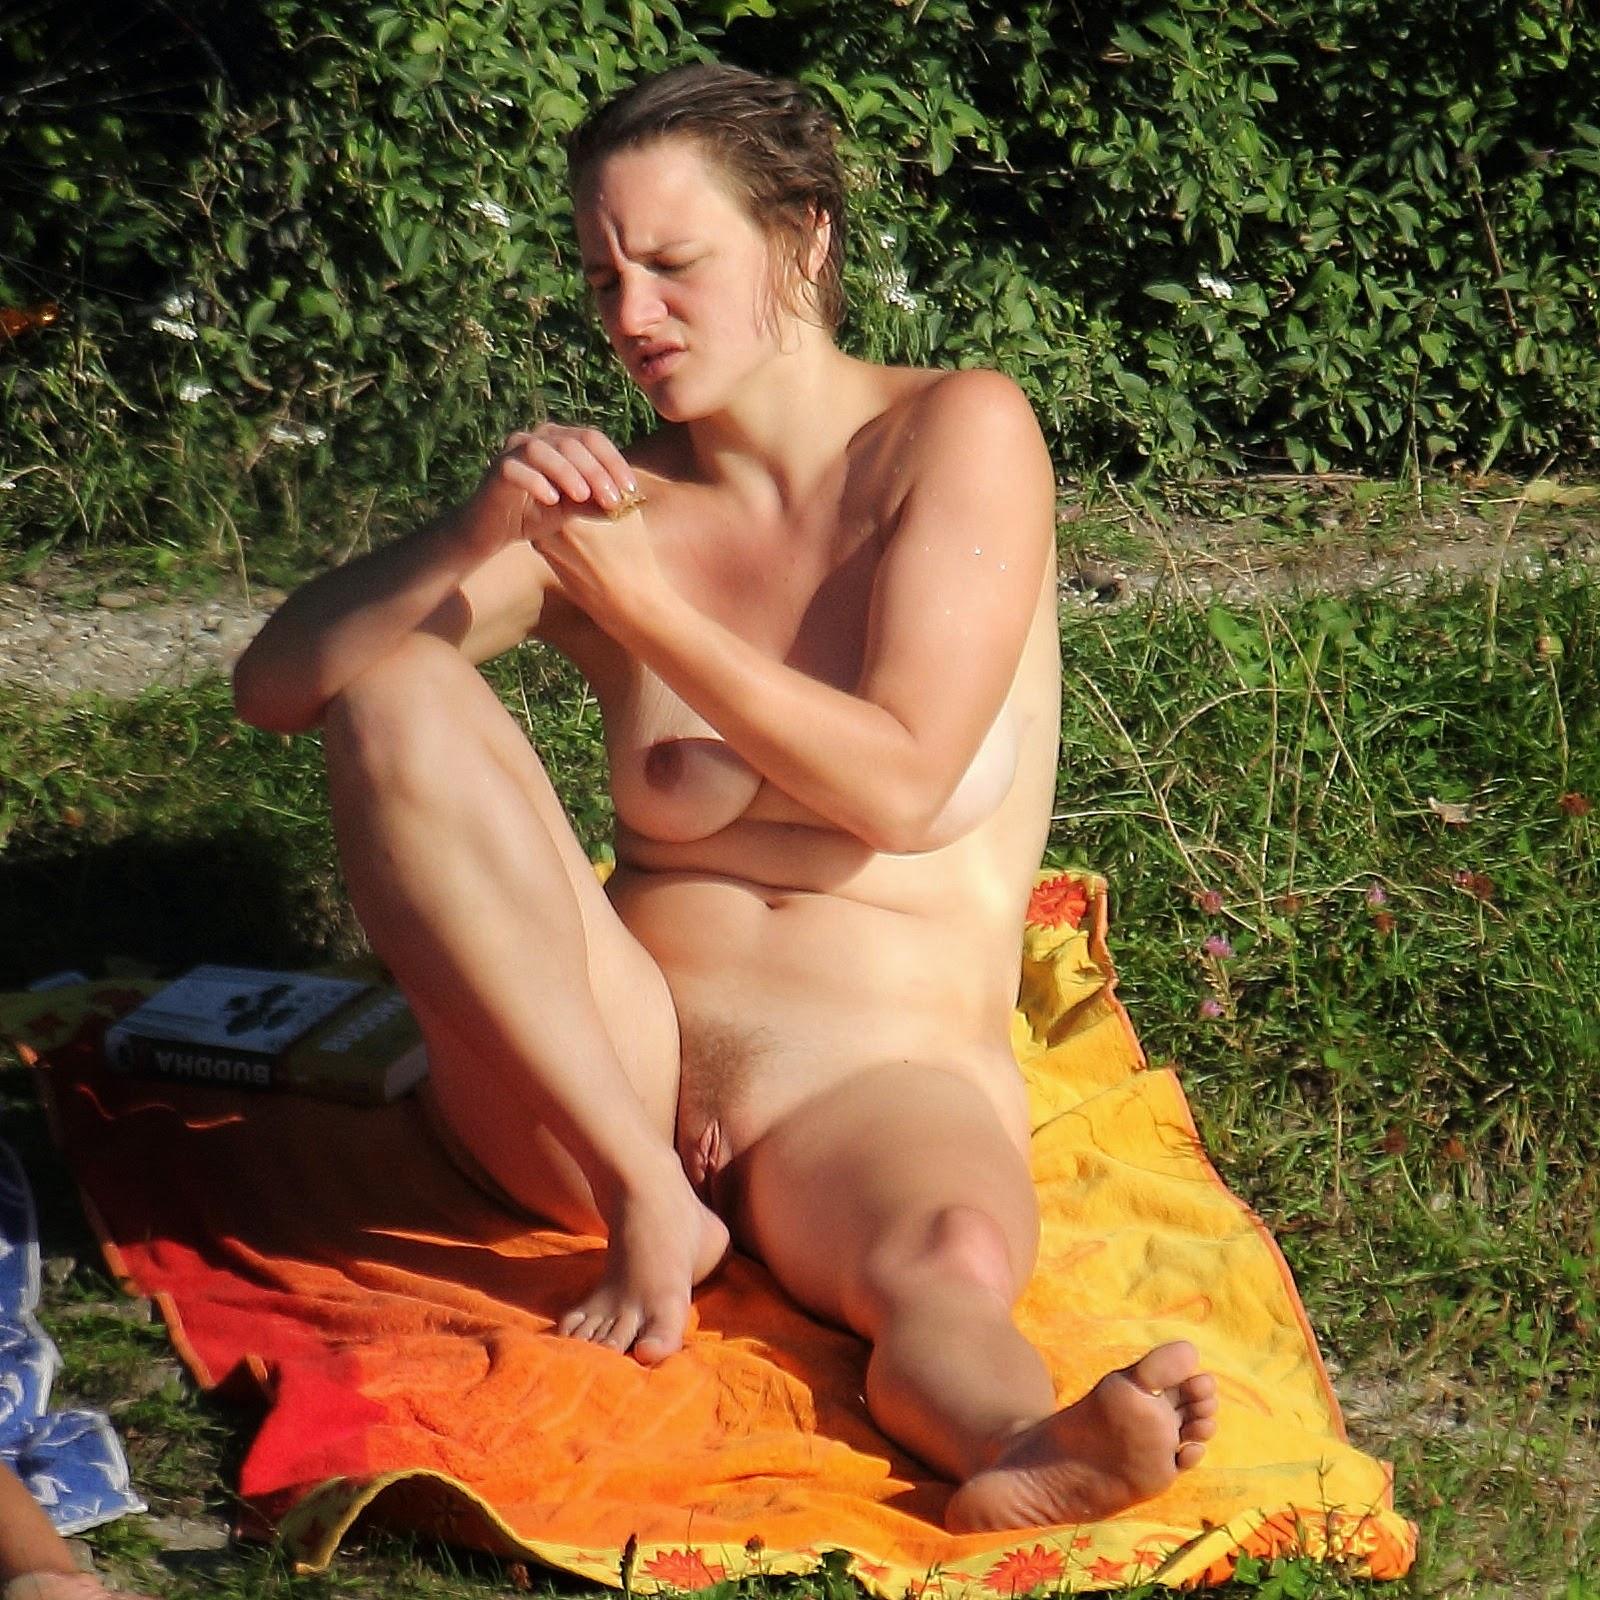 Nudism - Photo - HQ : Nude lakes beach - FKK - spaced legs